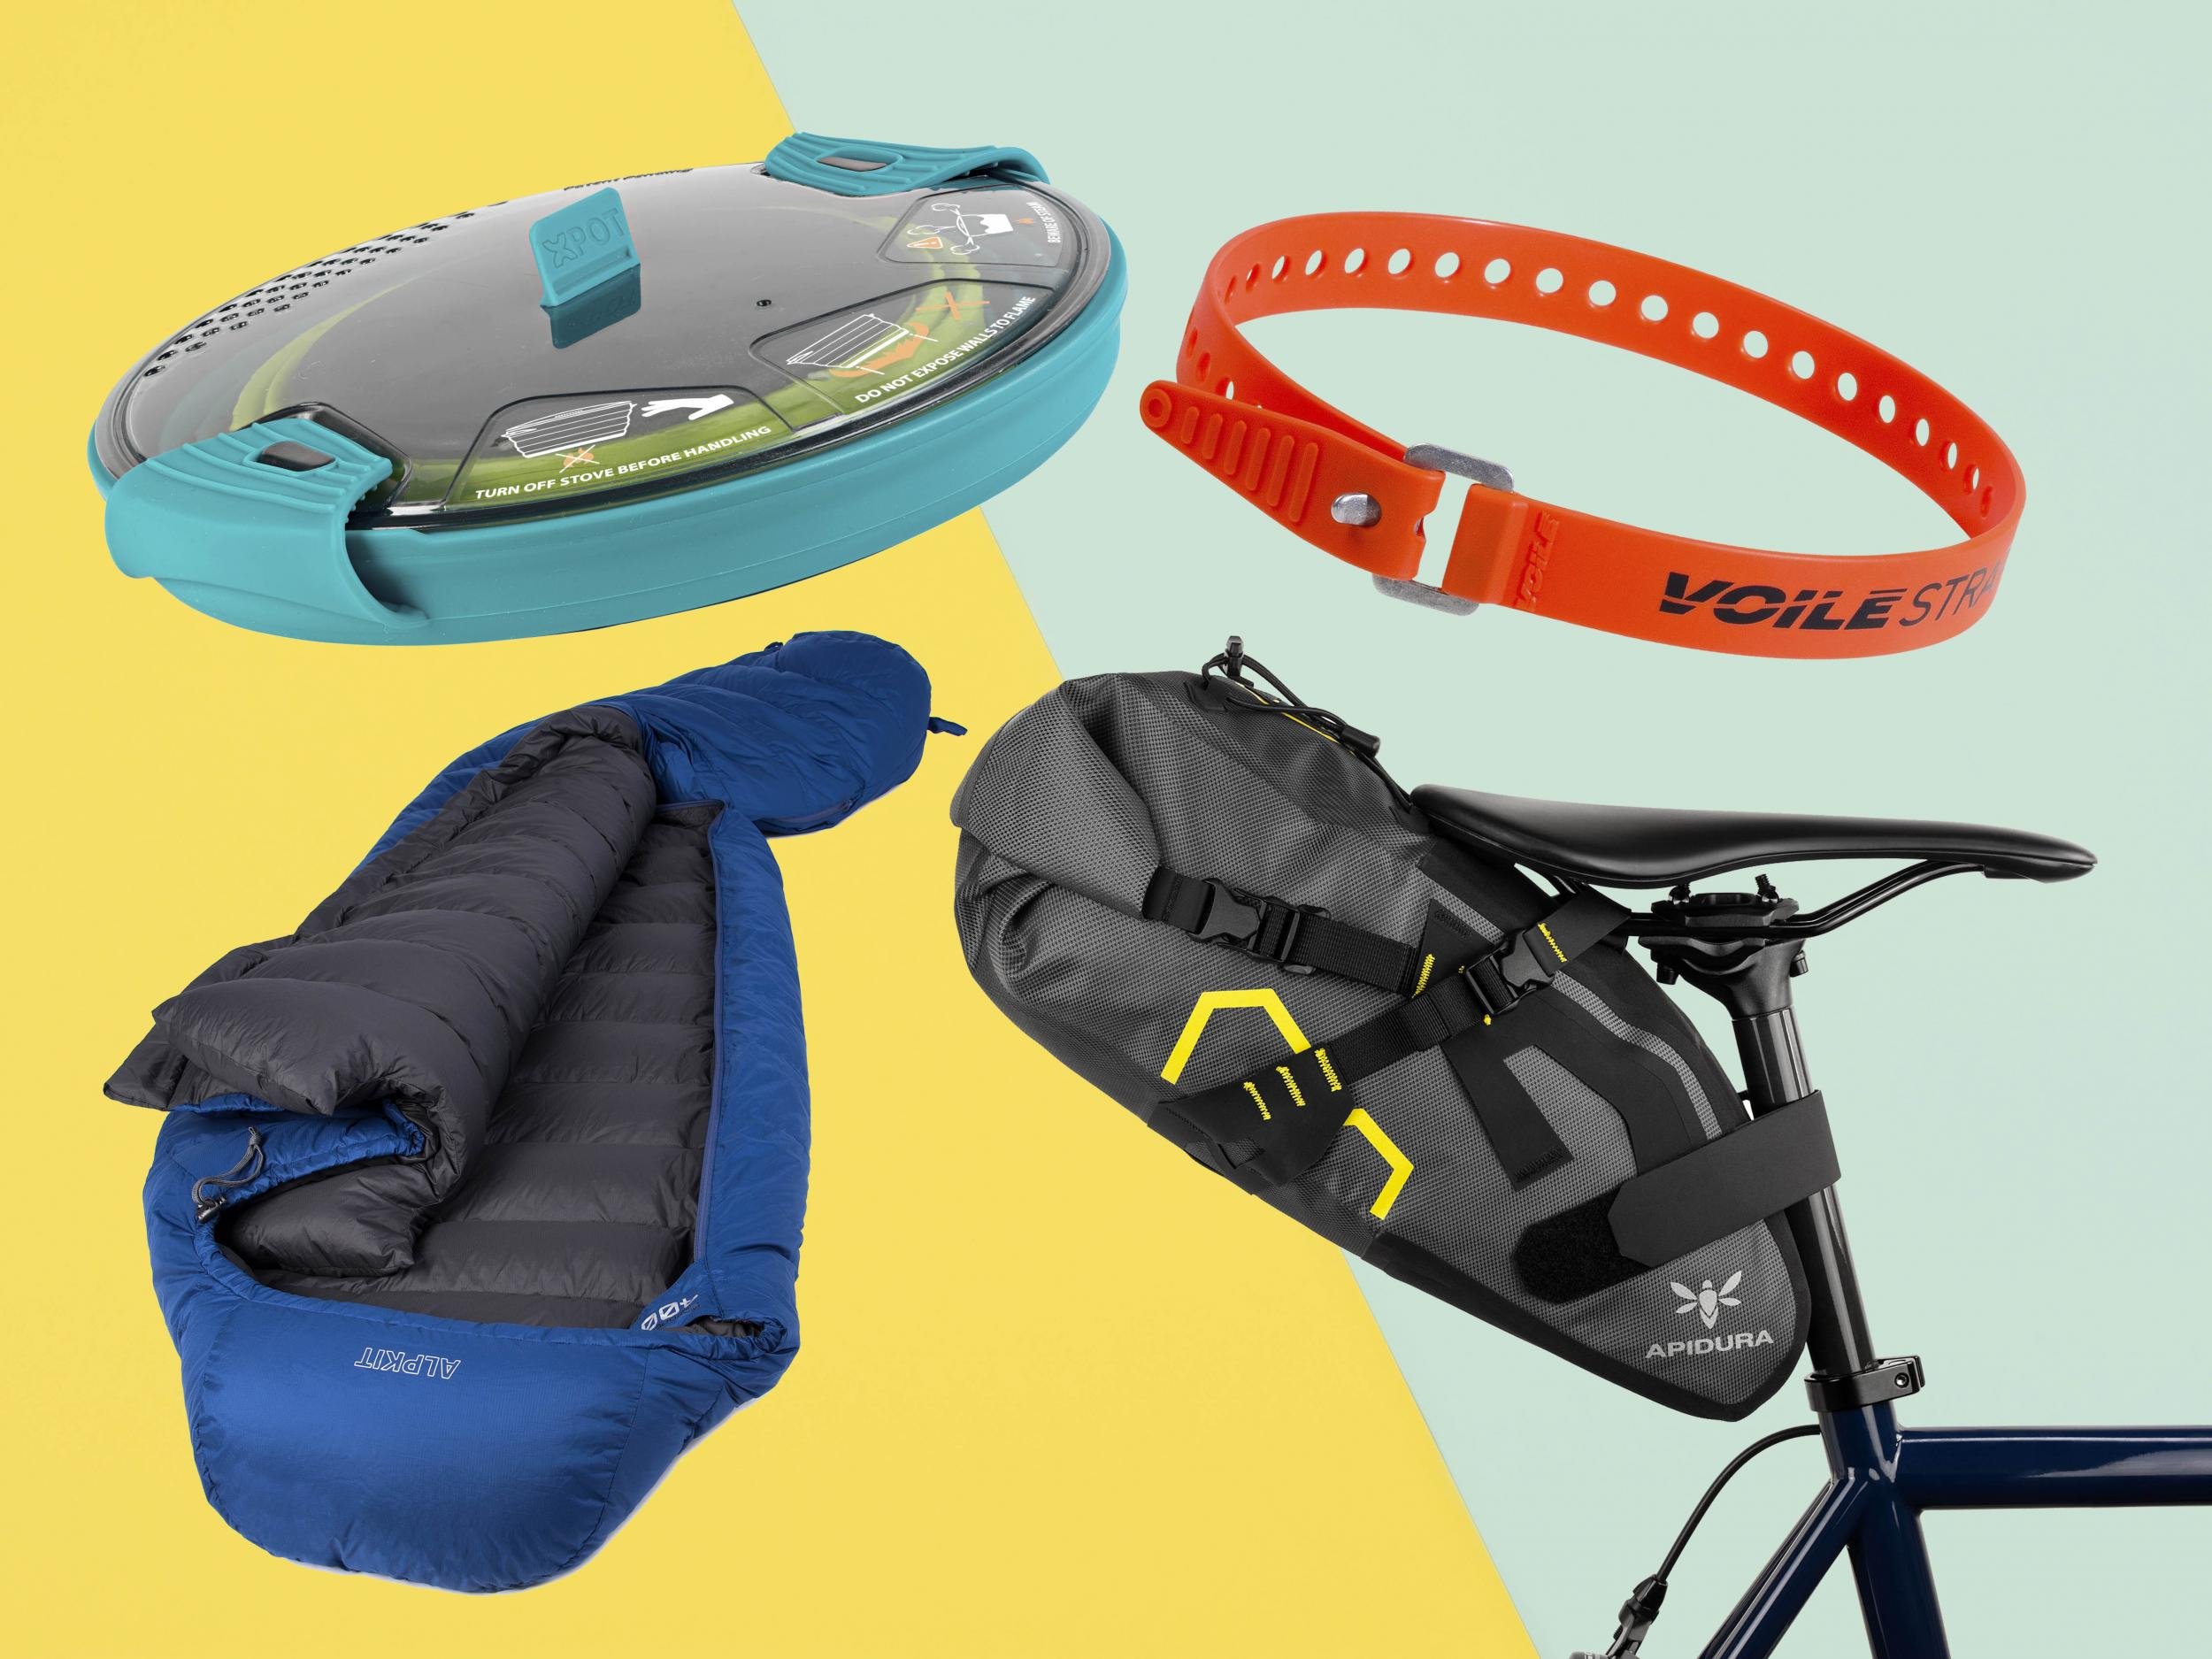 Best bikepacking kit: Lightweight camping accessories, sleeping bags